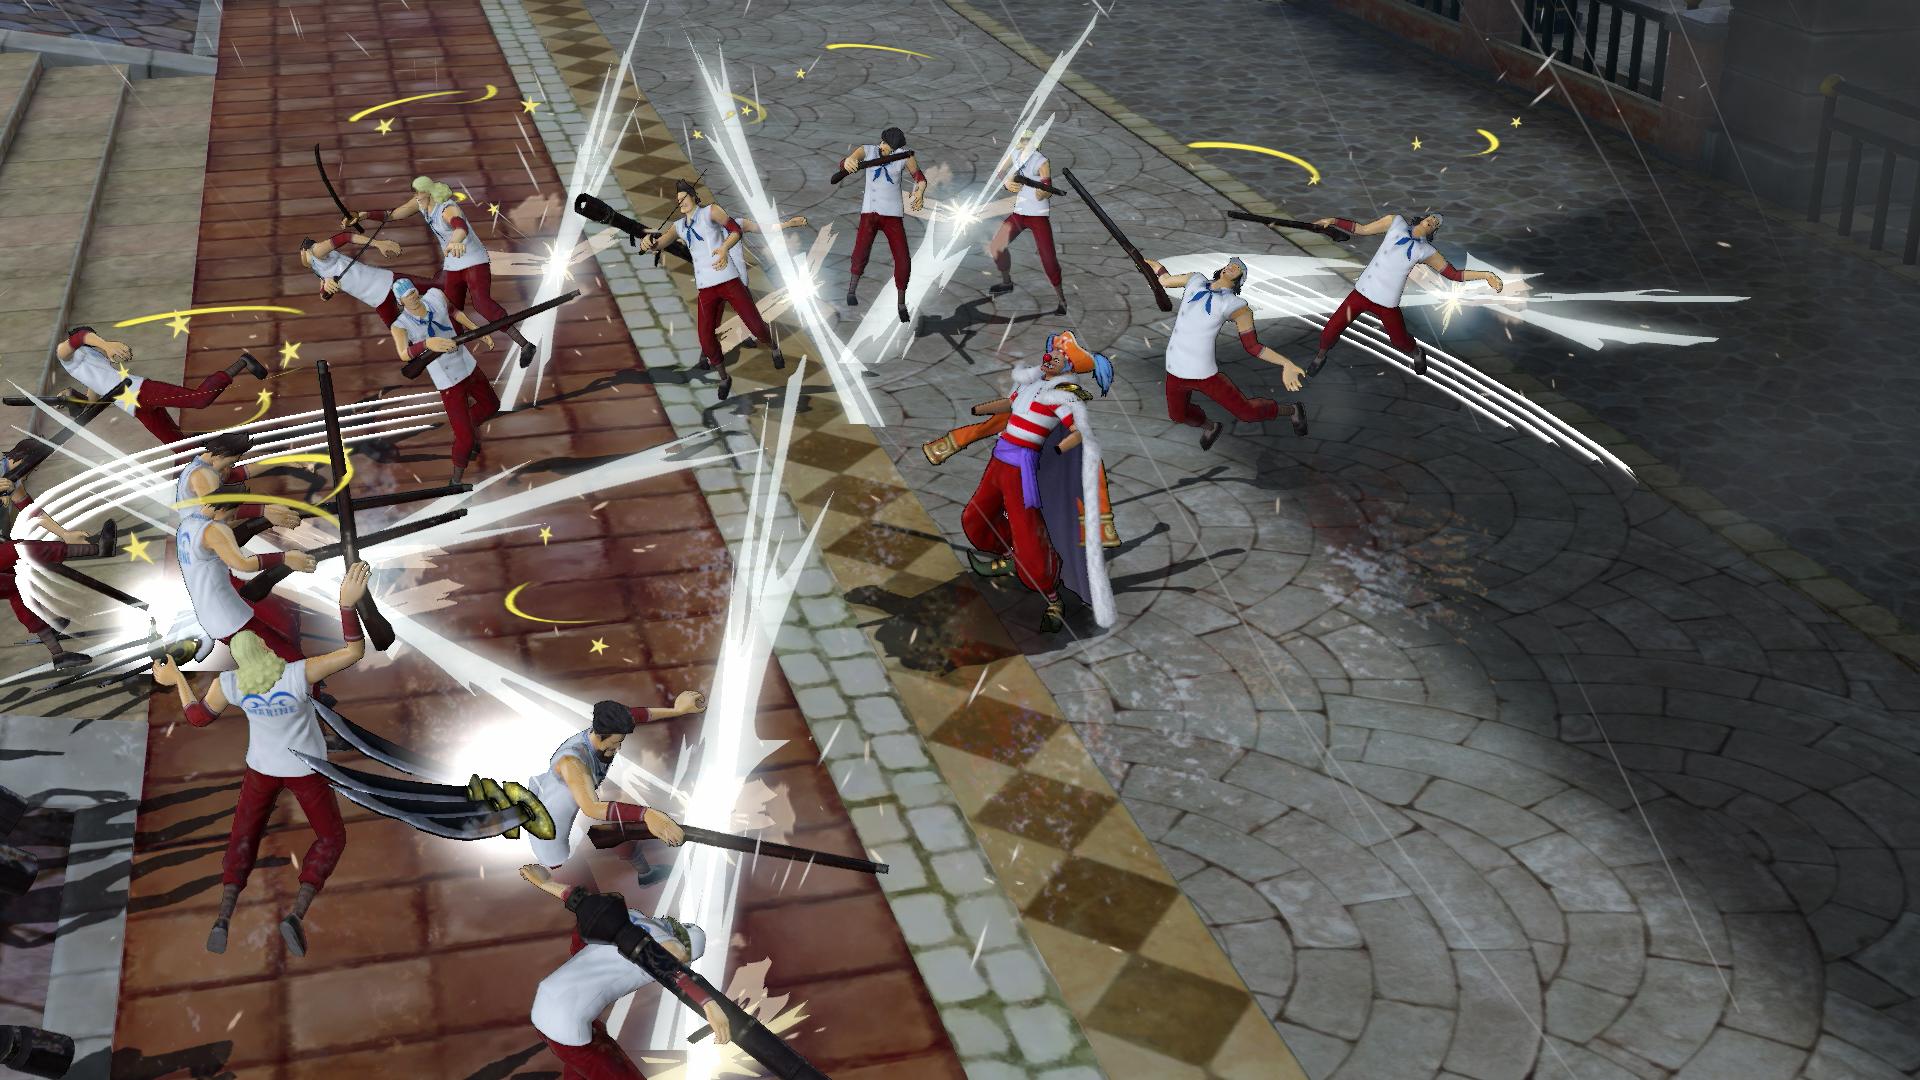 One_Piece_Pirate_Warriors_3_03.jpg